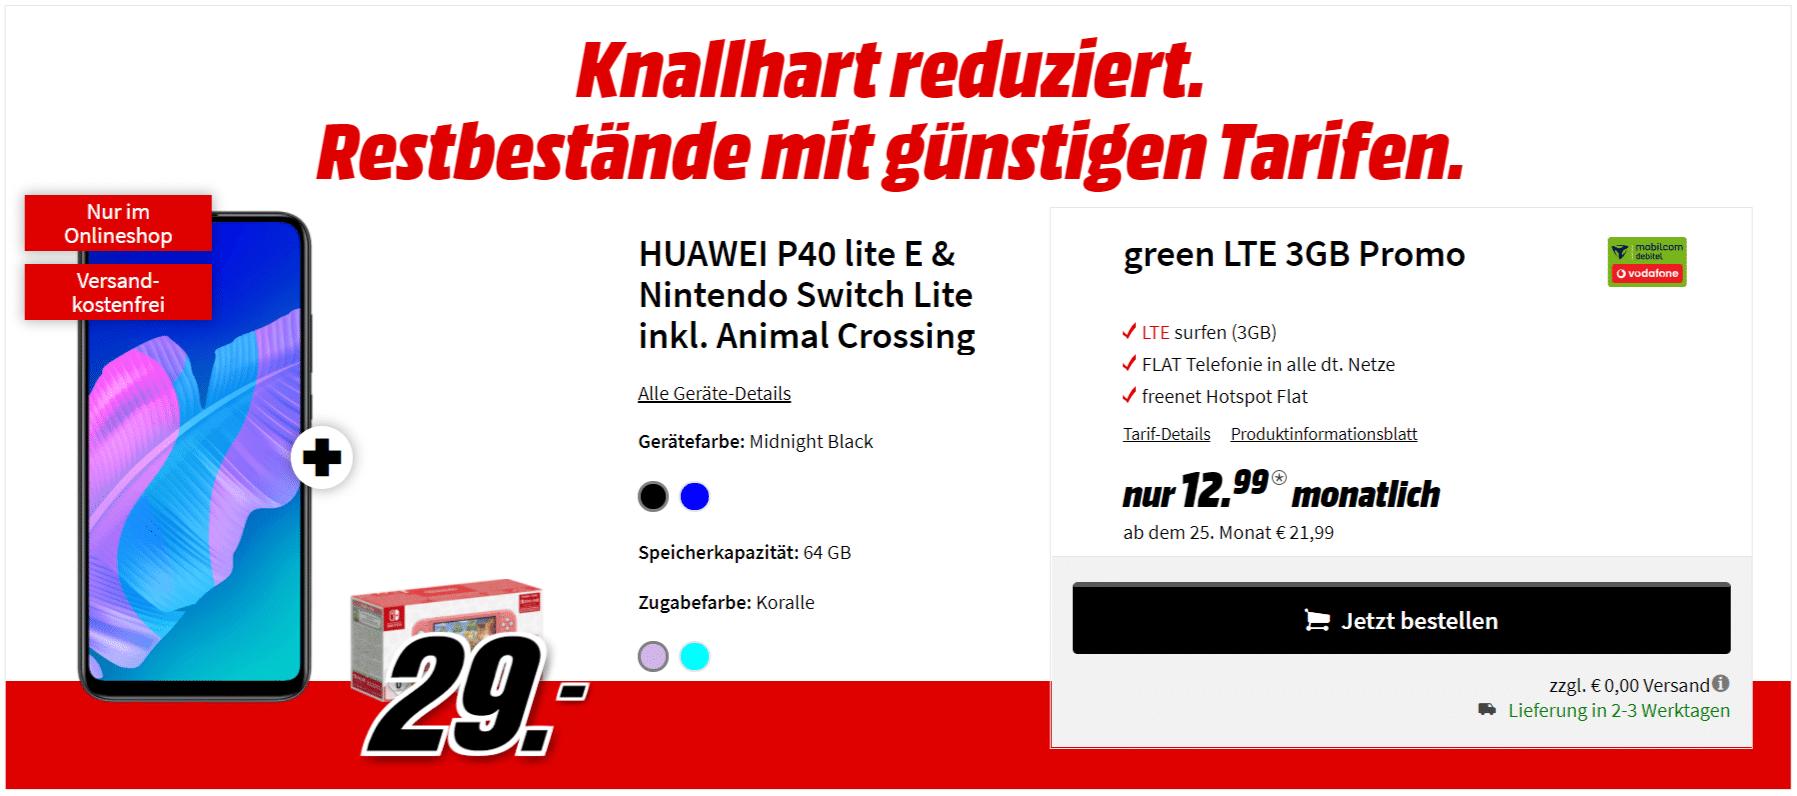 https://tarife.mediamarkt.de/smartphones/huawei/p40-lite-switch-lite/?farbe=midnight-black&speicher=128&carrier=vodafone&tarif=green-lte-3gb-promotion